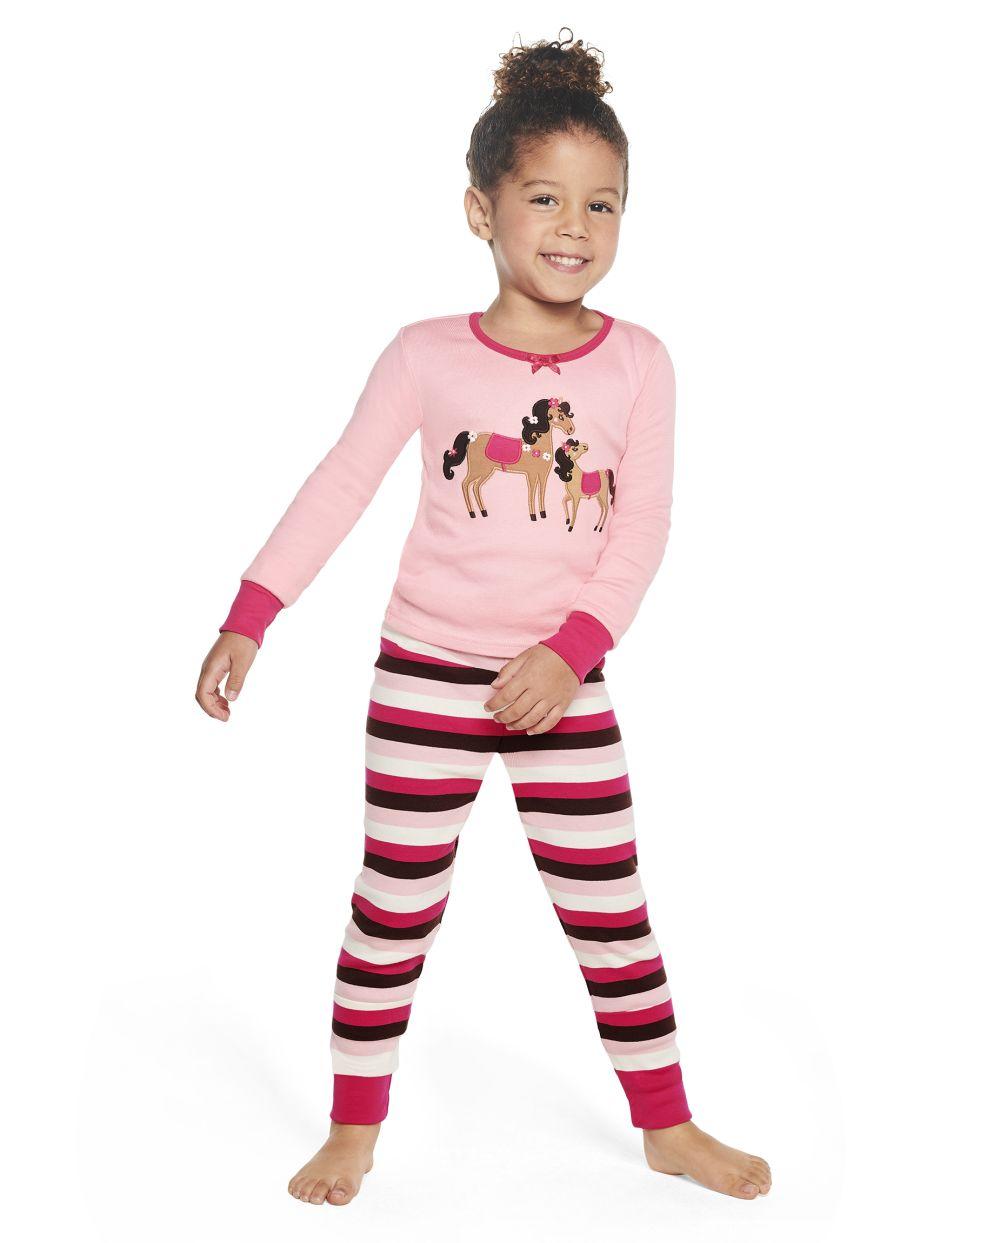 Girls Pony Club Cotton 2-Piece Pajamas - Gymmies